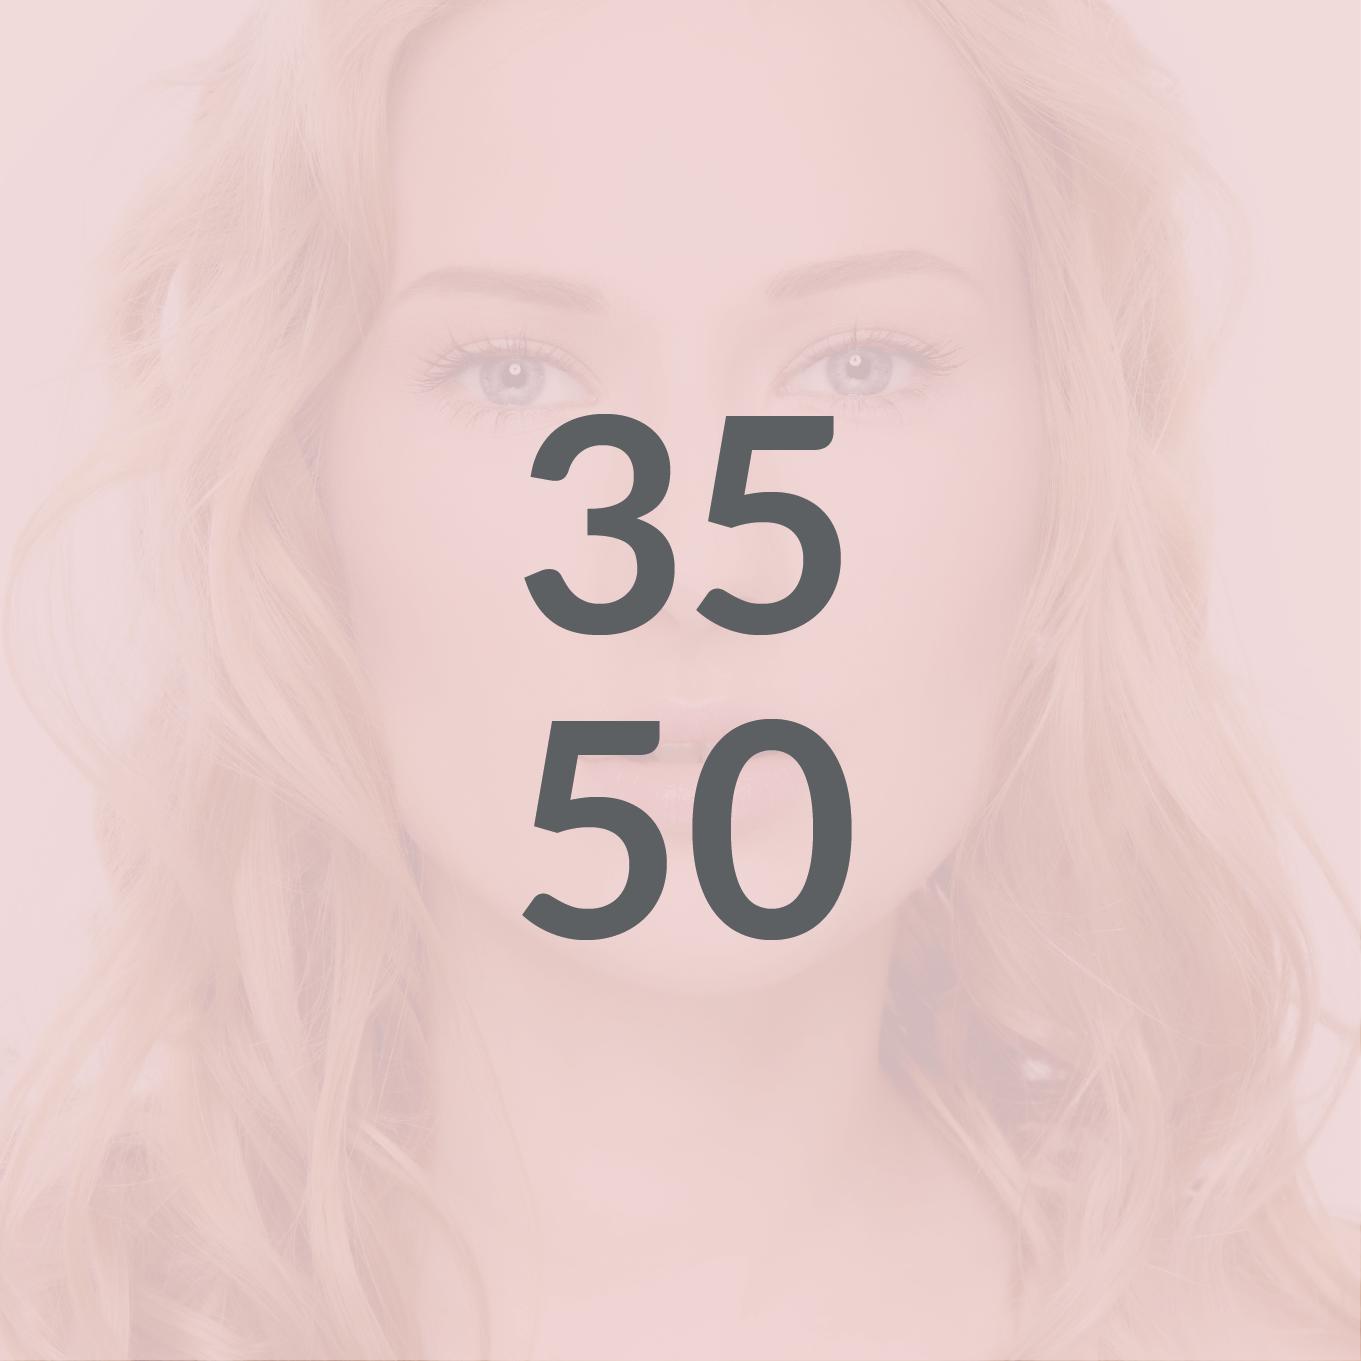 35-50